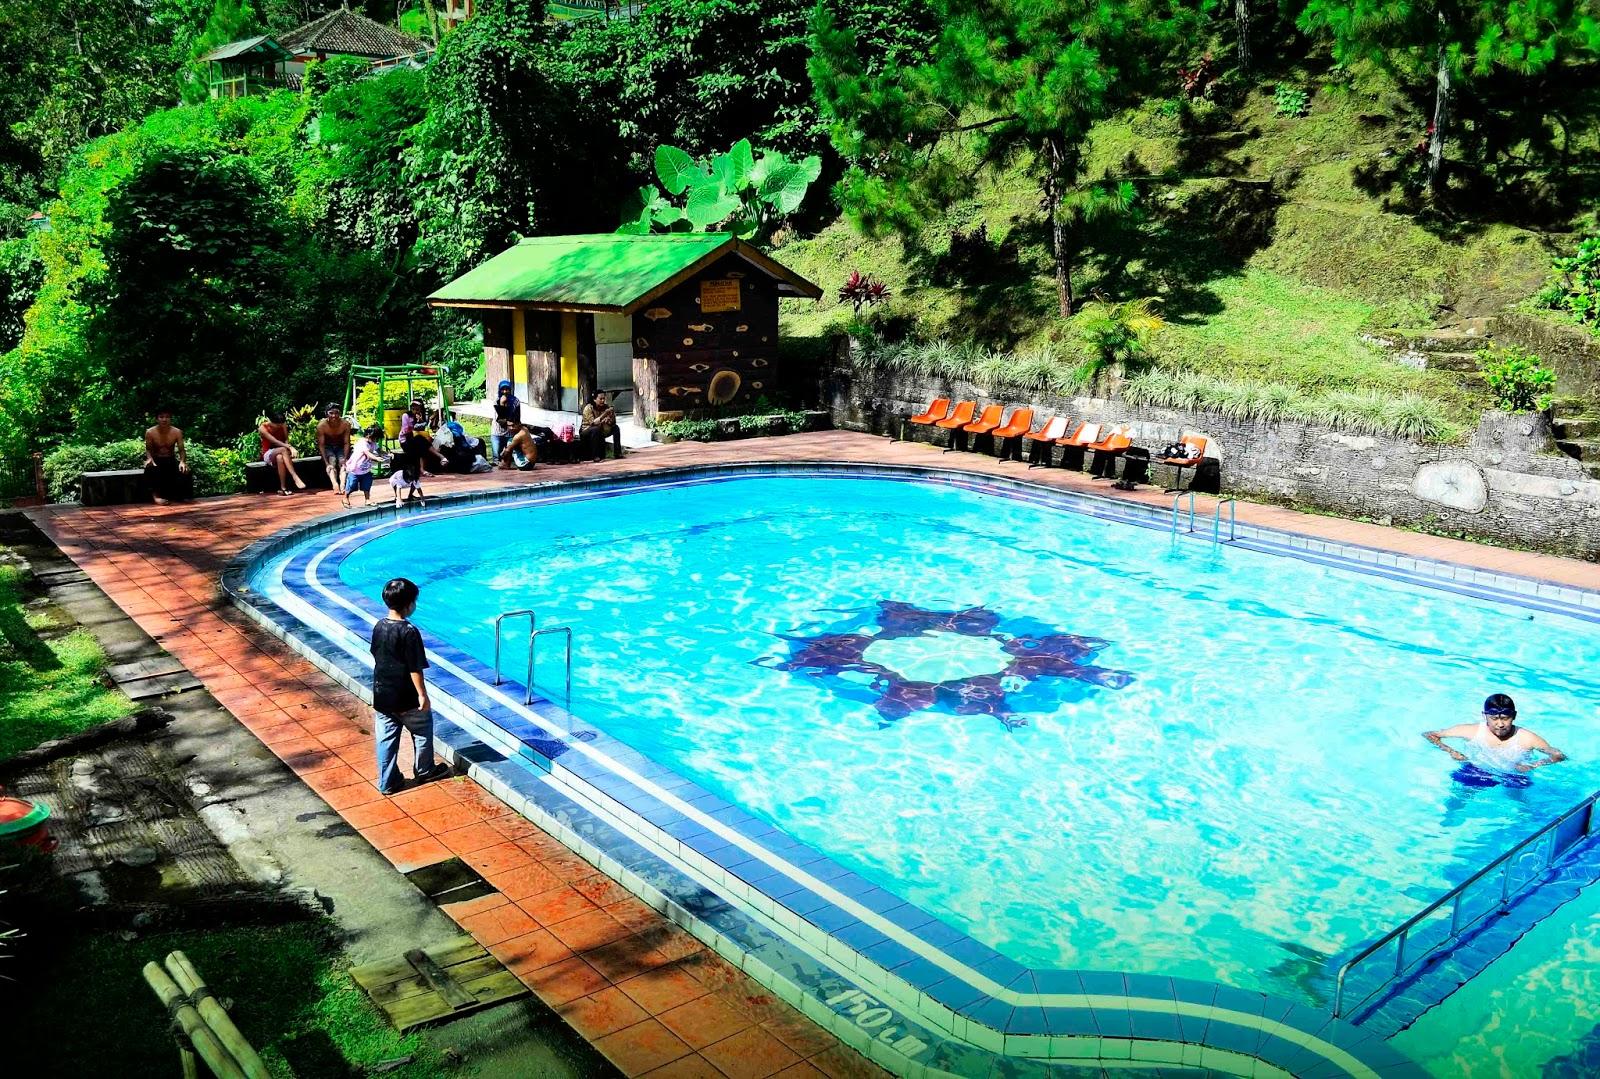 Wisata Tretes & Kakek Bodo Pasuruan JawaTimur  Info Wisata